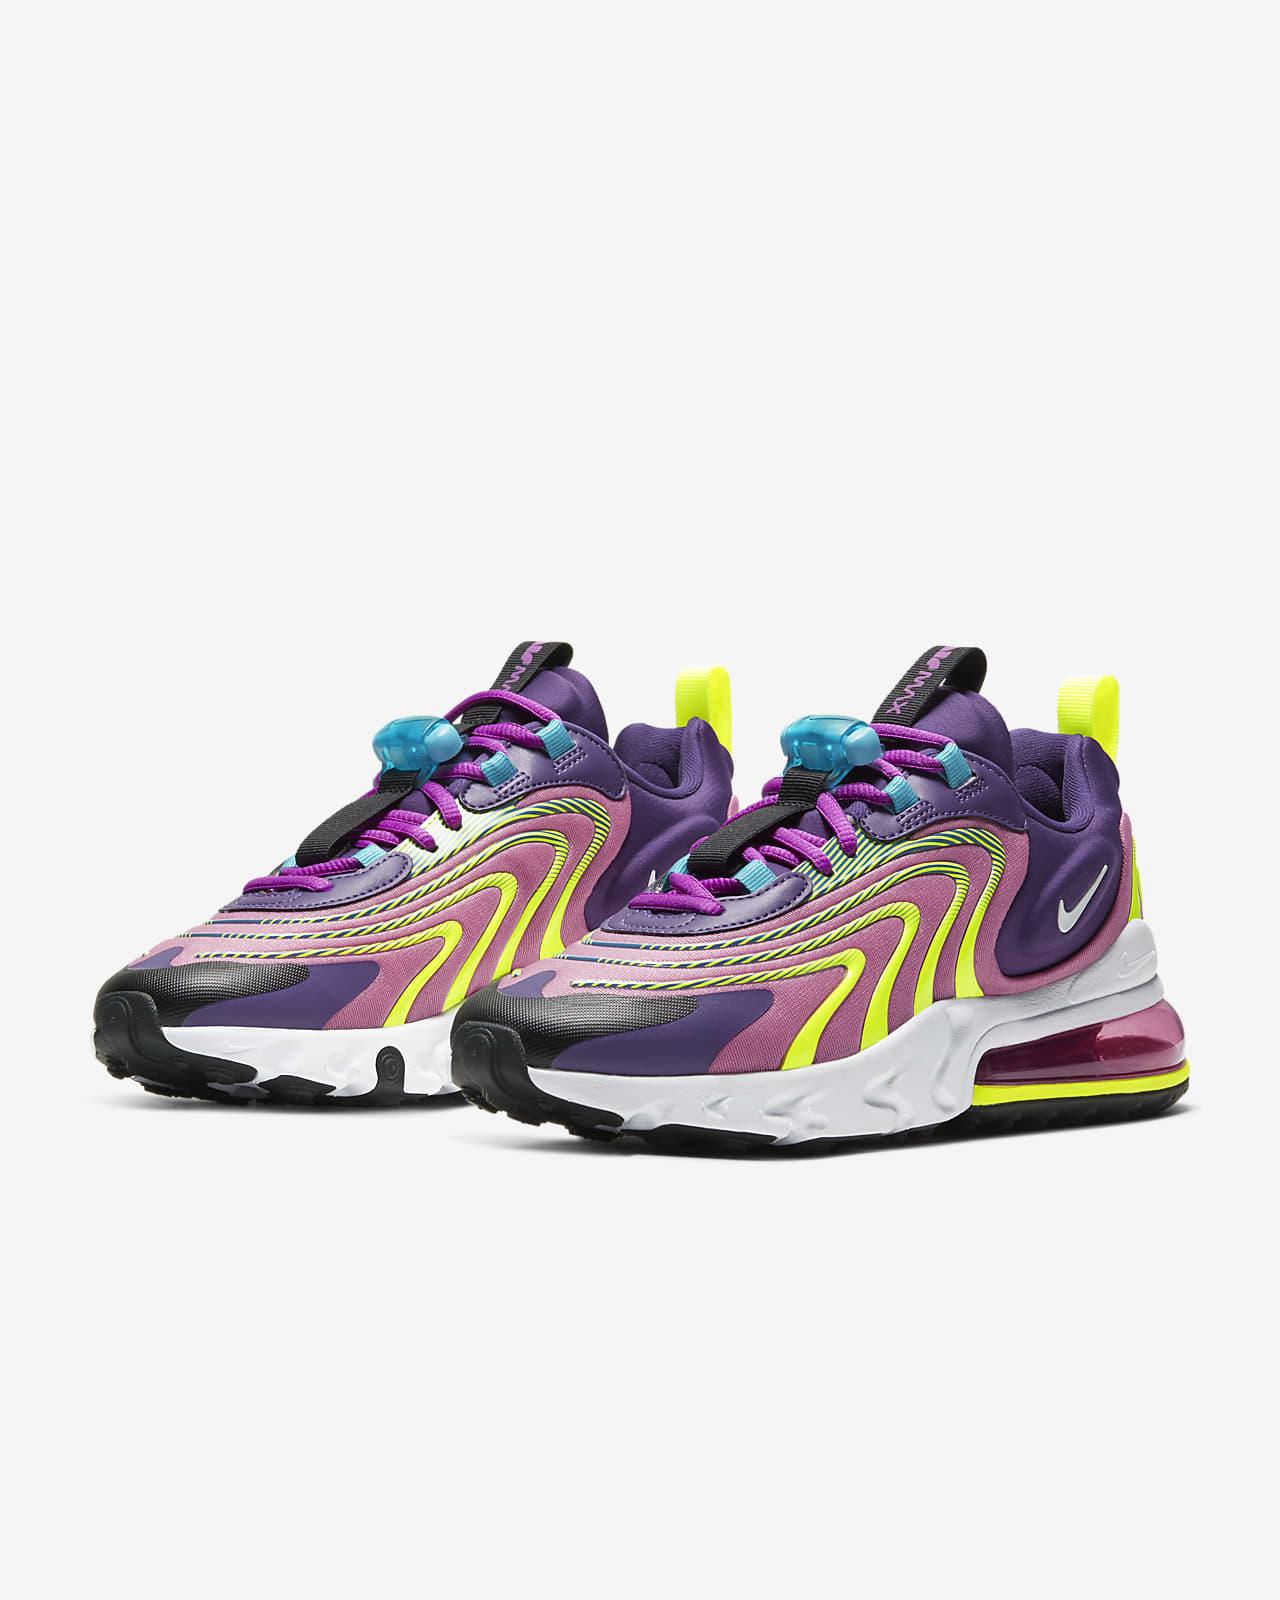 air max 270 violeta